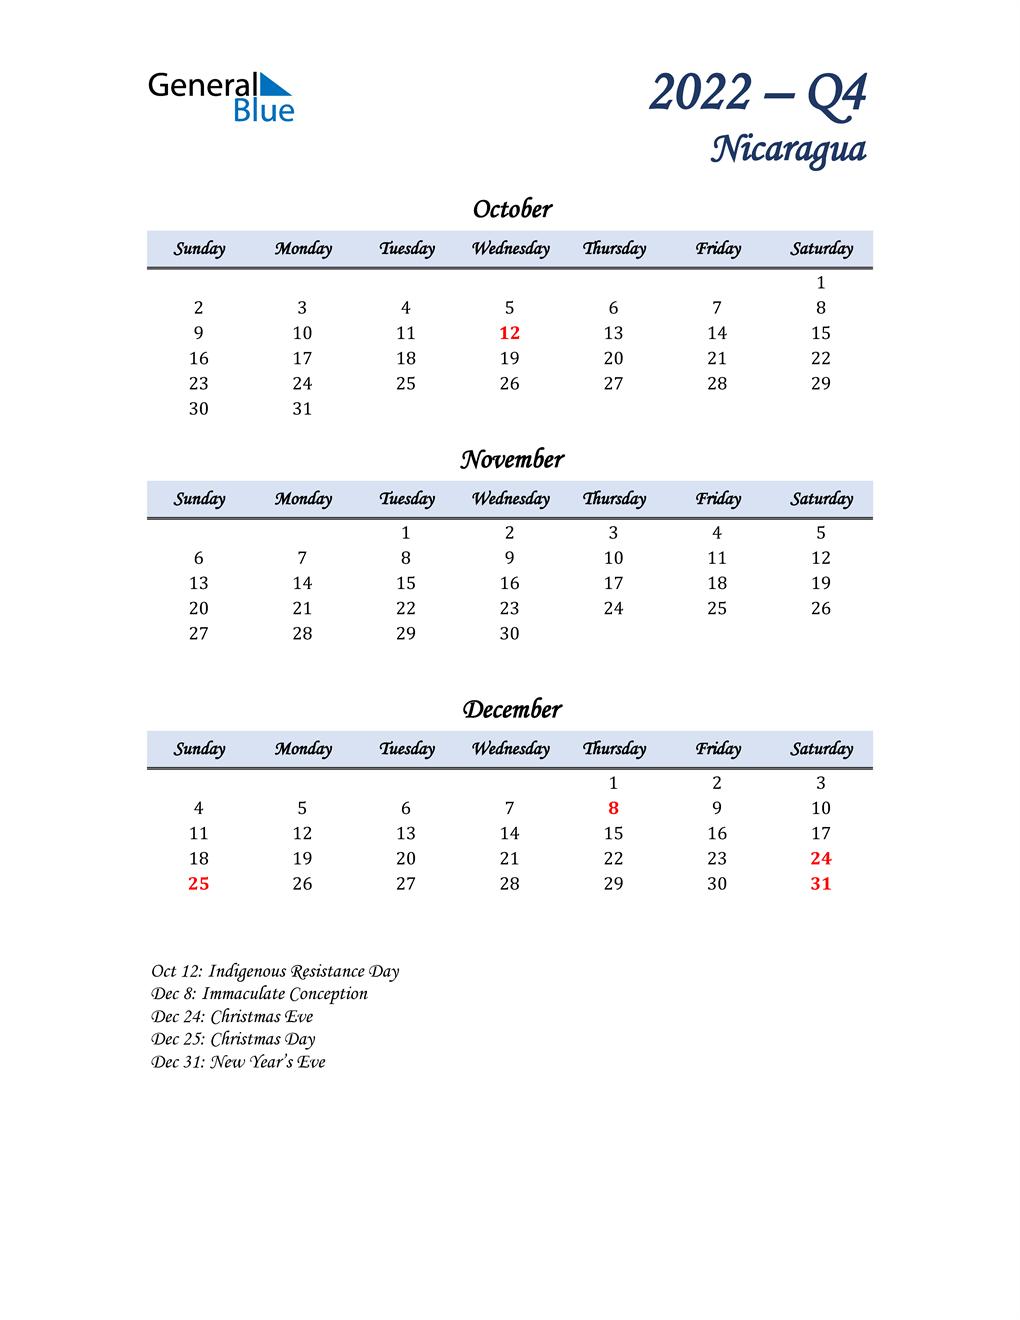 October, November, and December Calendar for Nicaragua